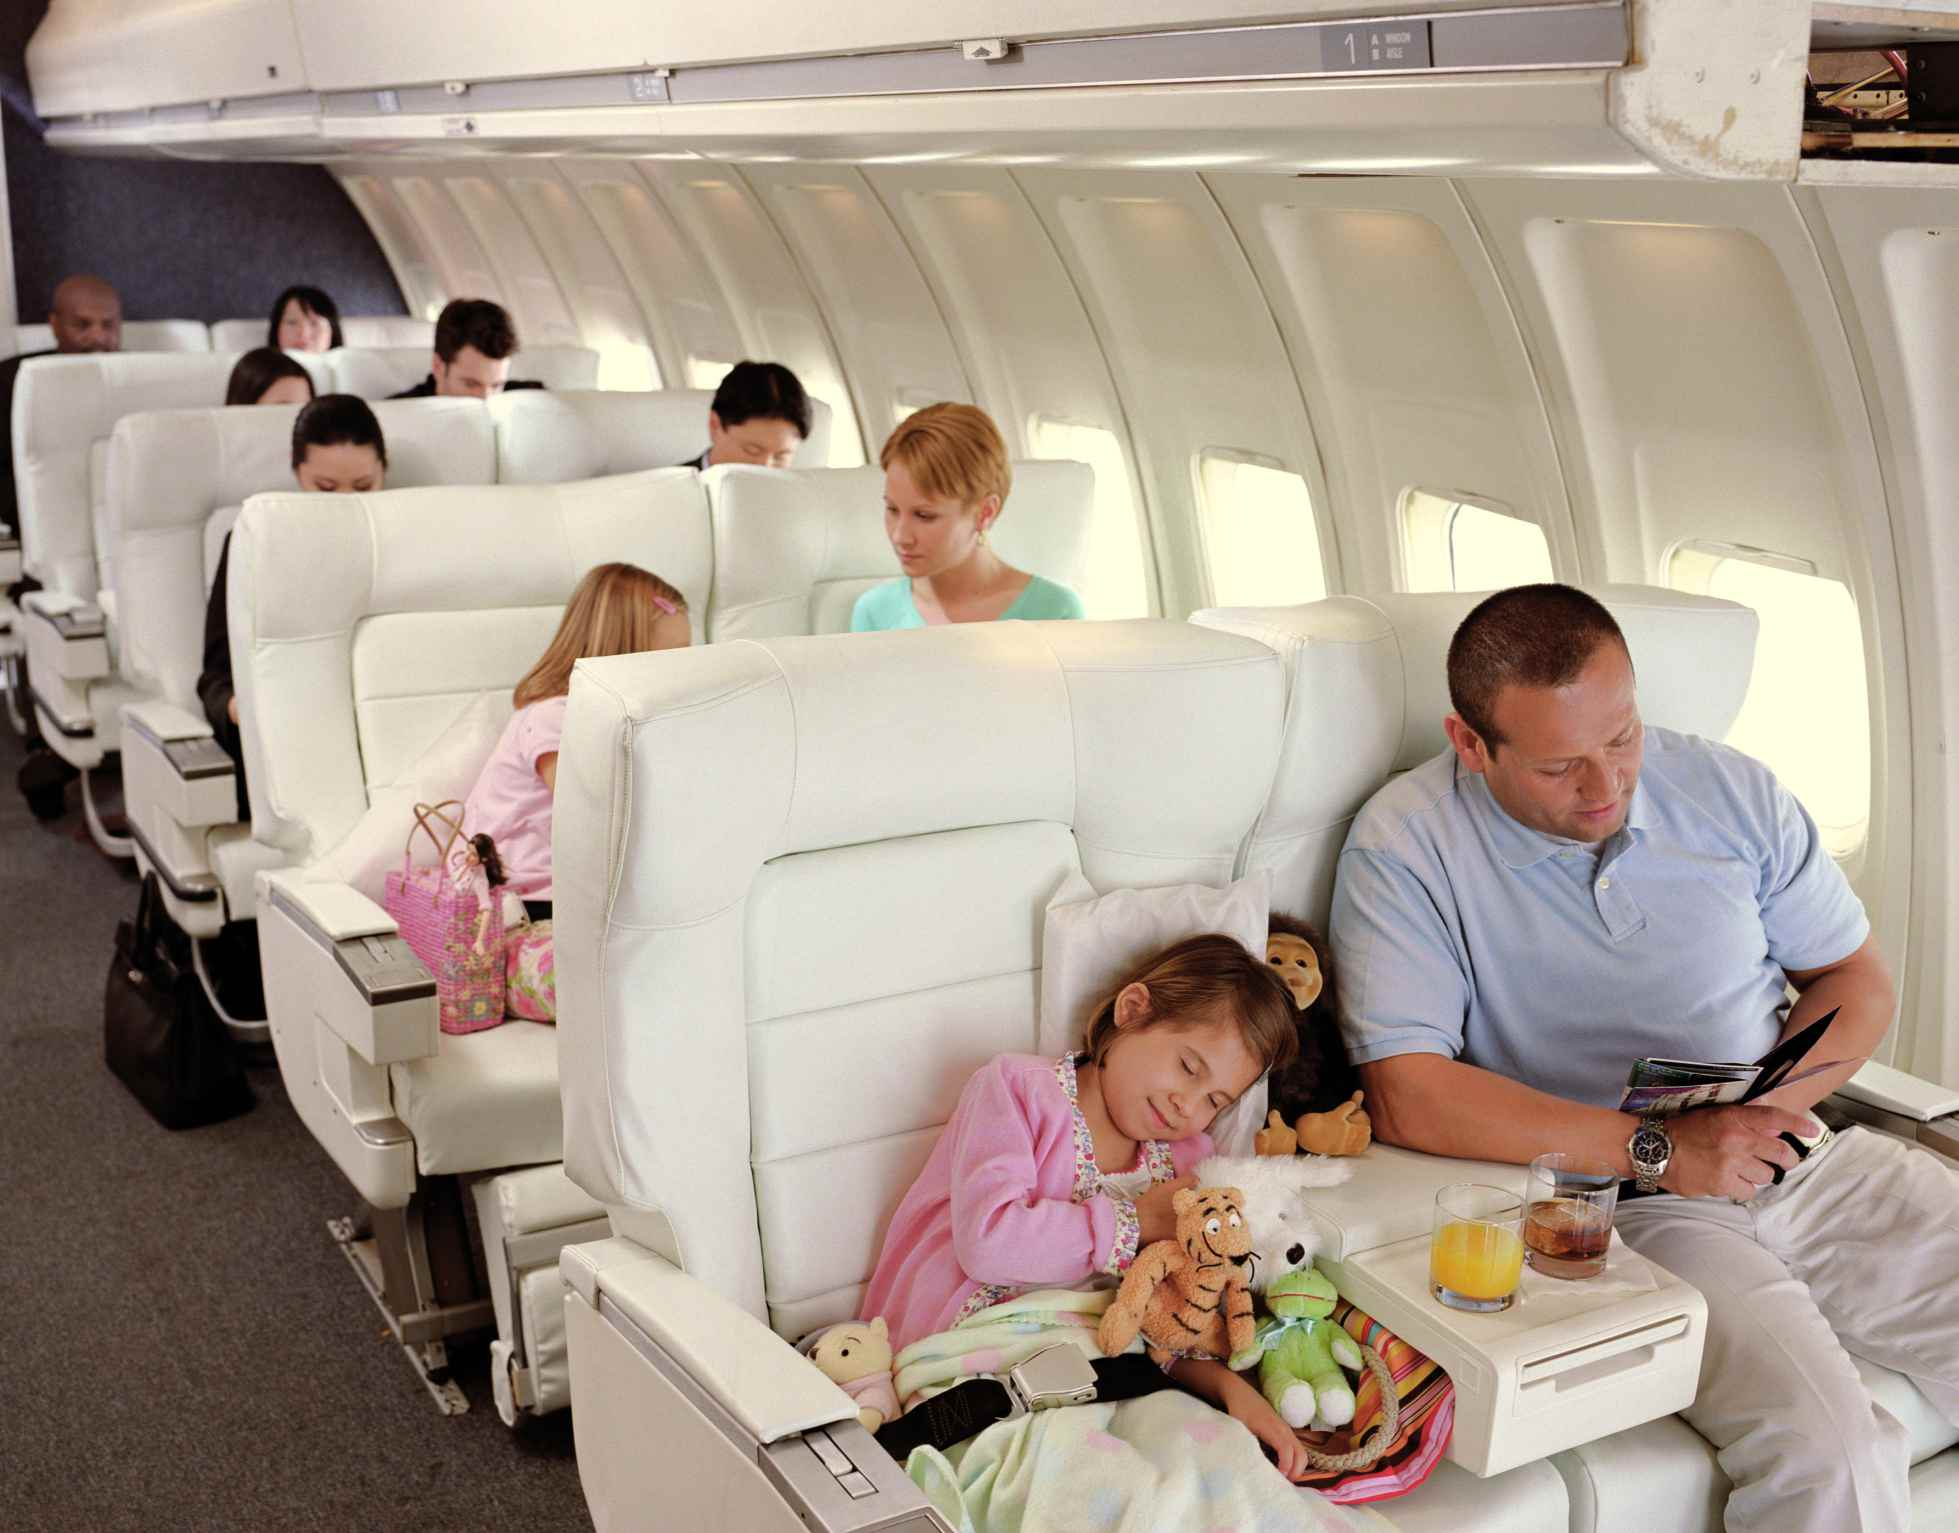 Families on plane